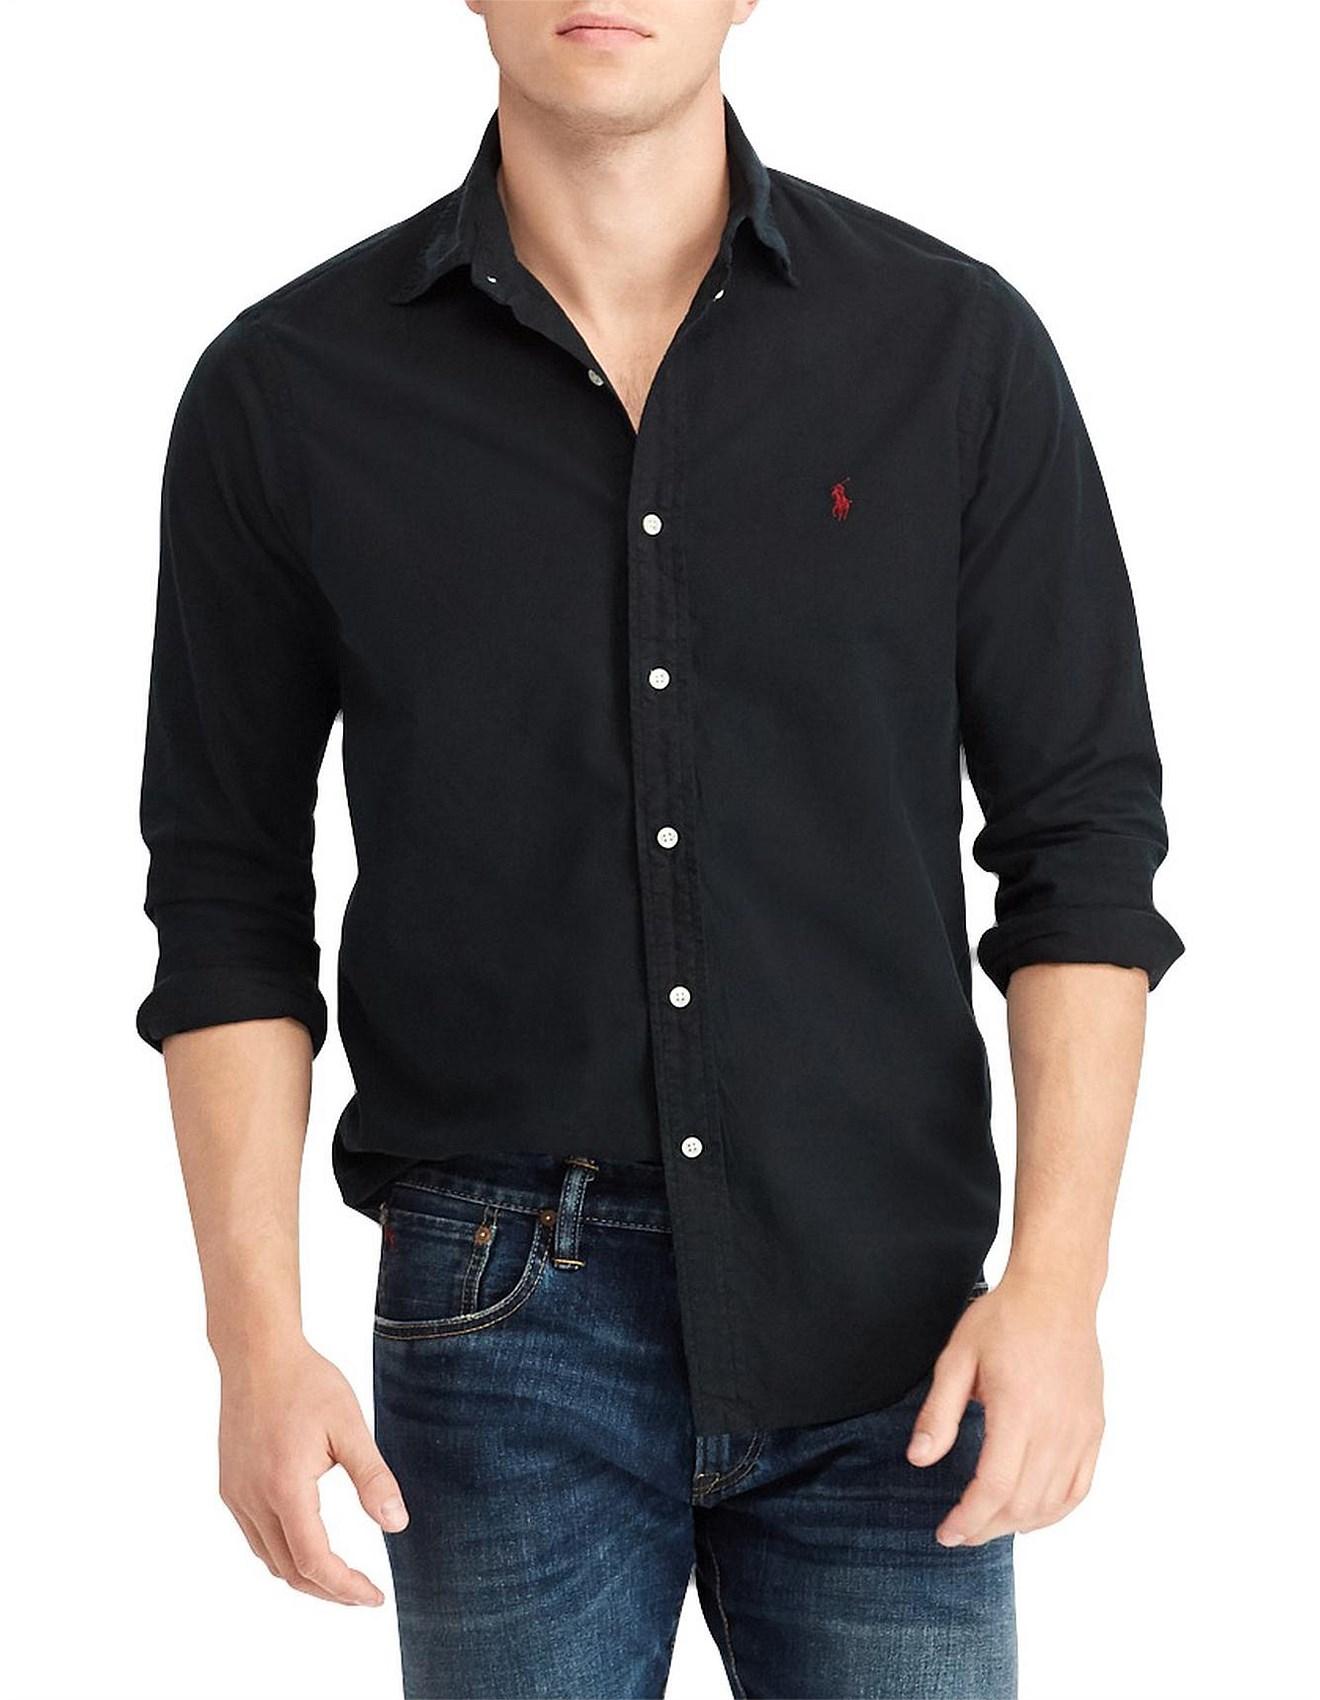 059066919 Polo Ralph Lauren | Buy Polo Ralph Lauren Online | David Jones - LONG SLEEVE  OXFORD SPORT SHIRT